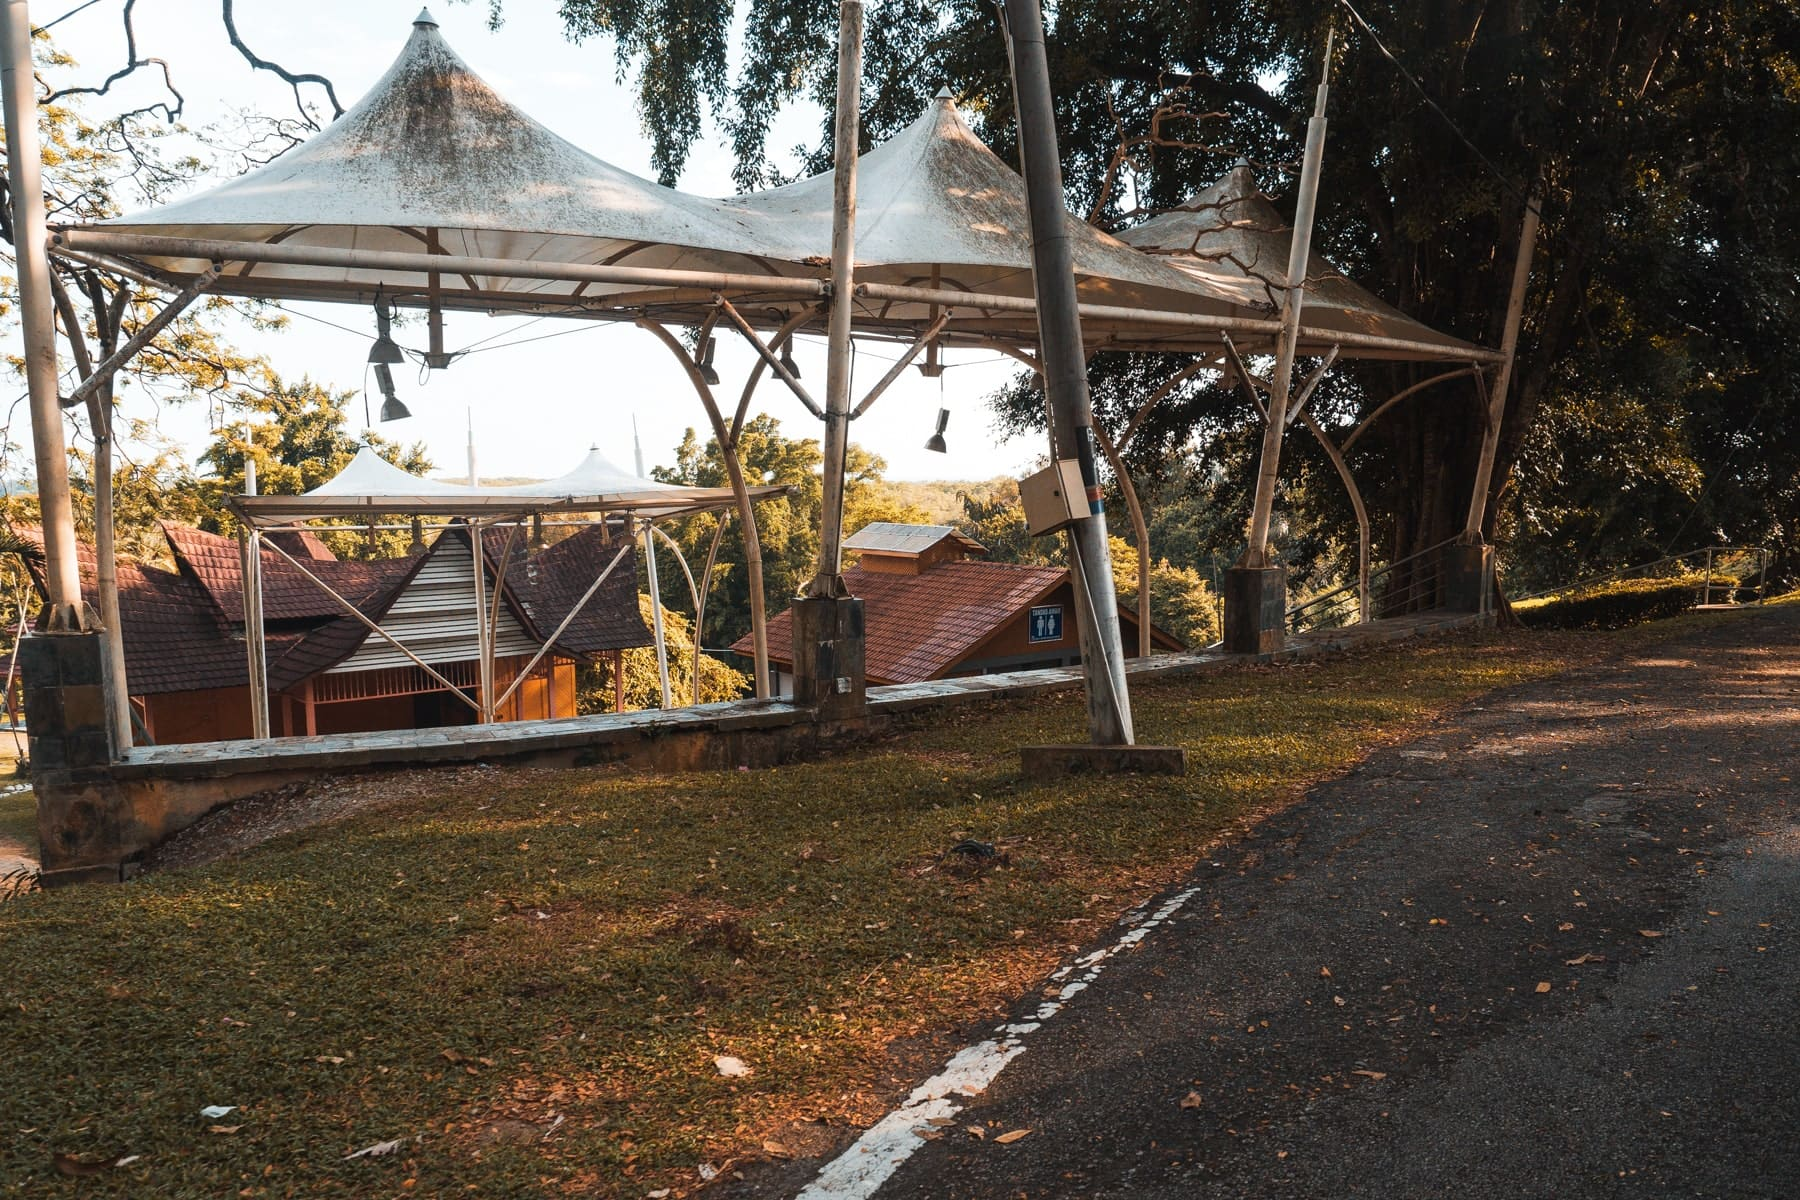 Malaysia Reisetipps: Tagesausflug von Kuala Lumpur nach Kuala Selangor